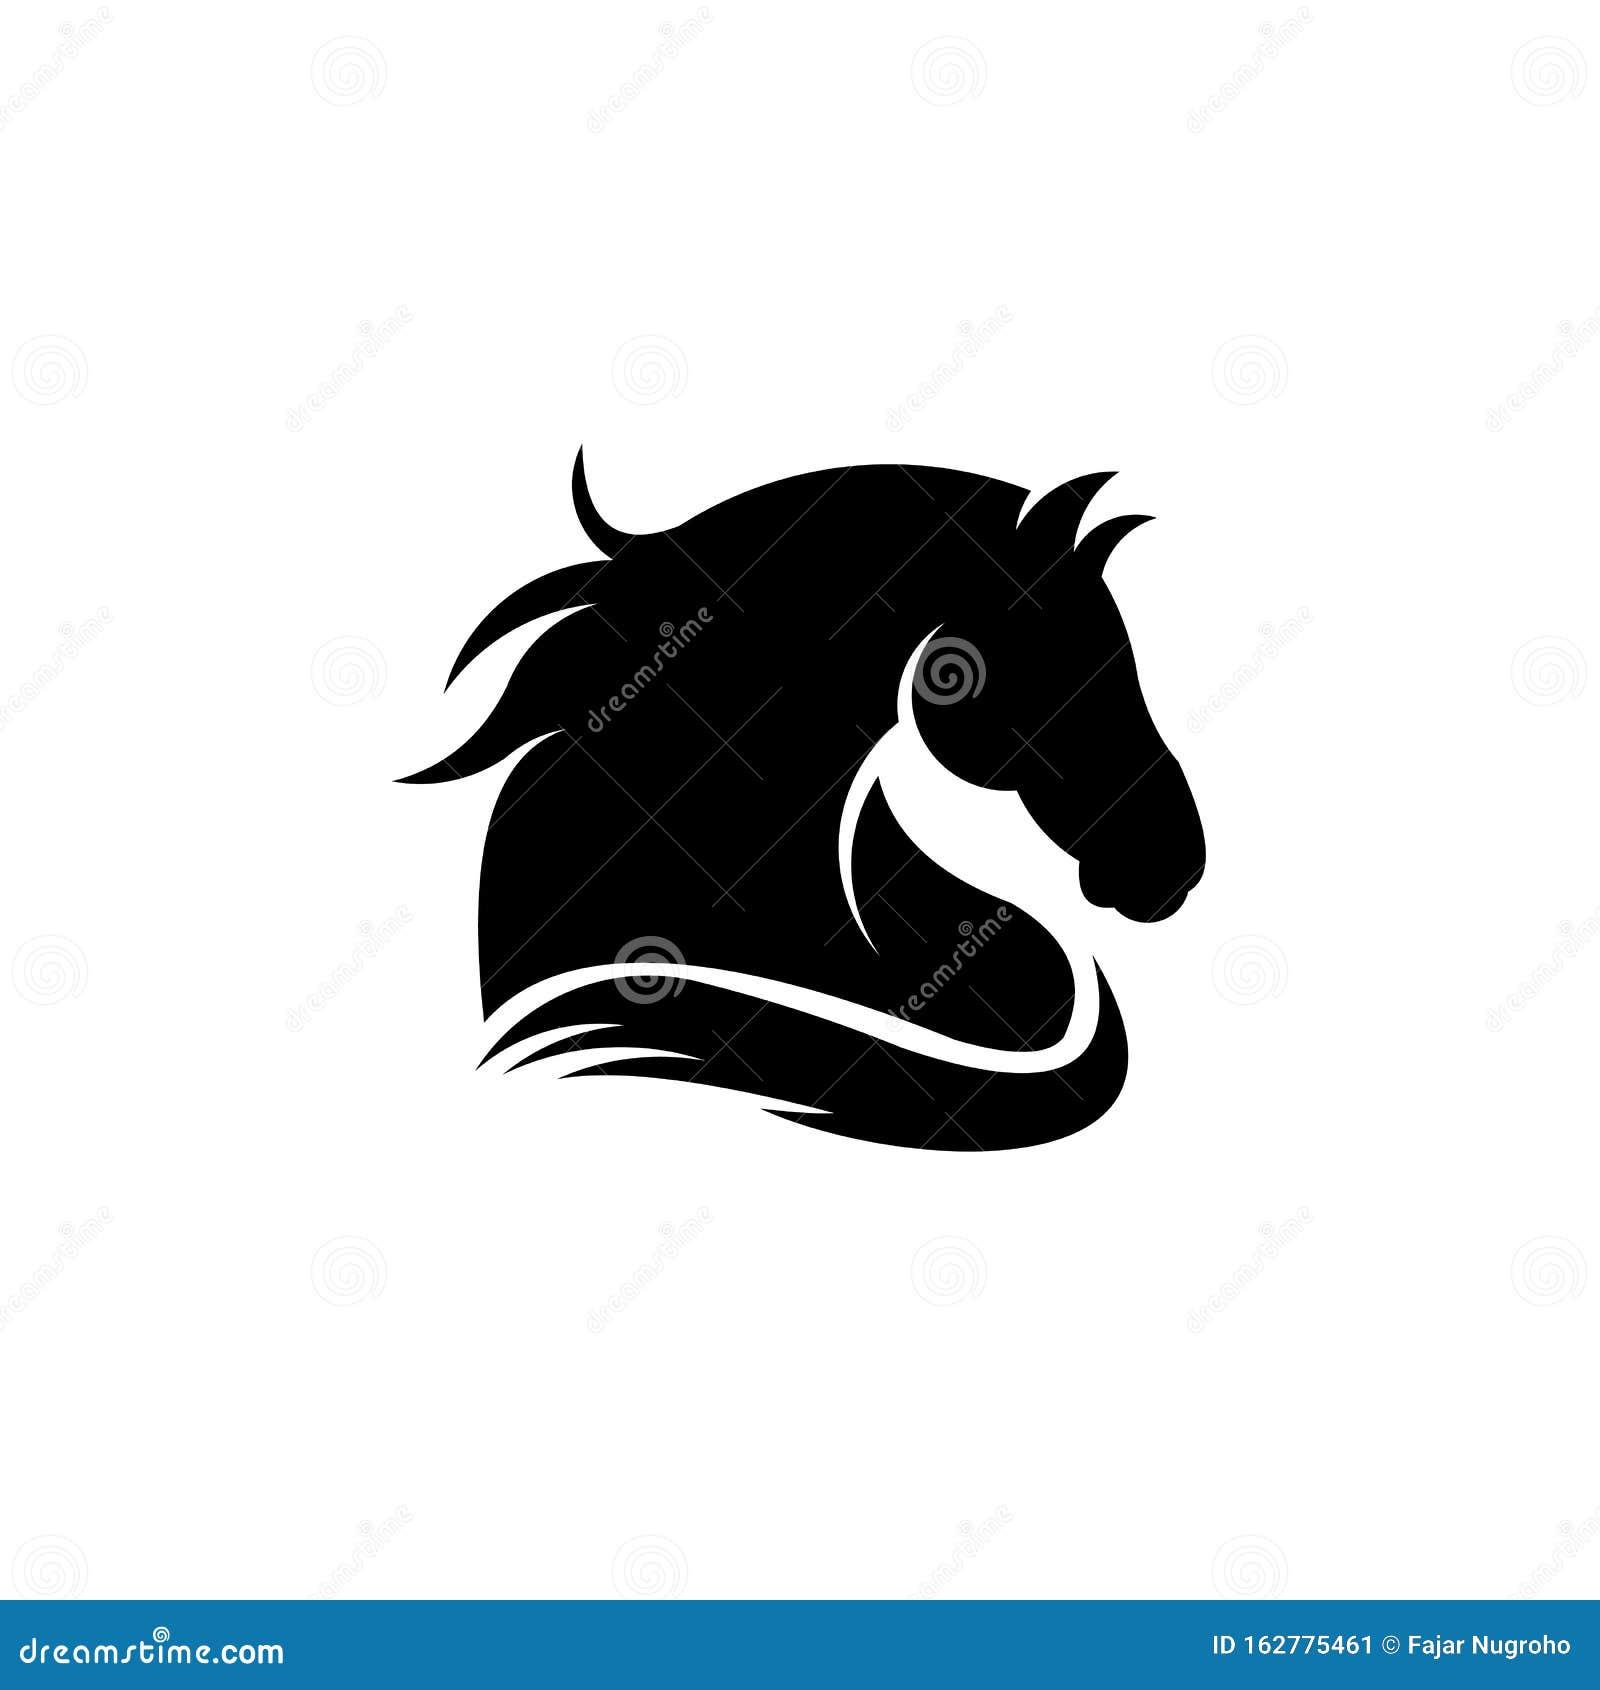 Inspiration Logo Vector Animal Horse Head Stock Vector Illustration Of Bronco Mustang 162775461